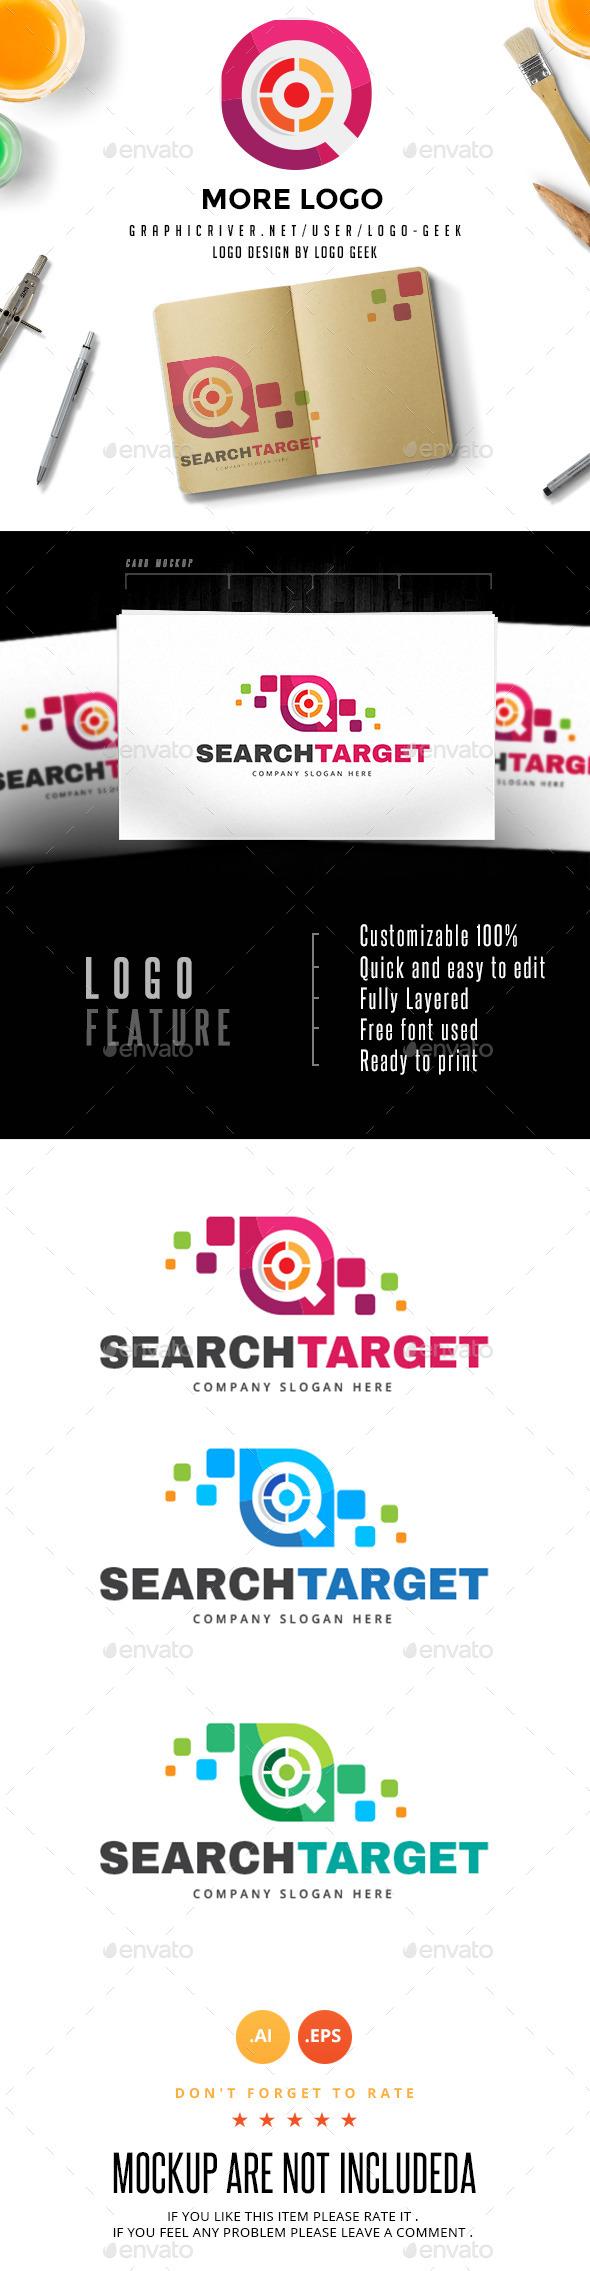 Logo Design that will Create Brand IdentityCustom Logo Design